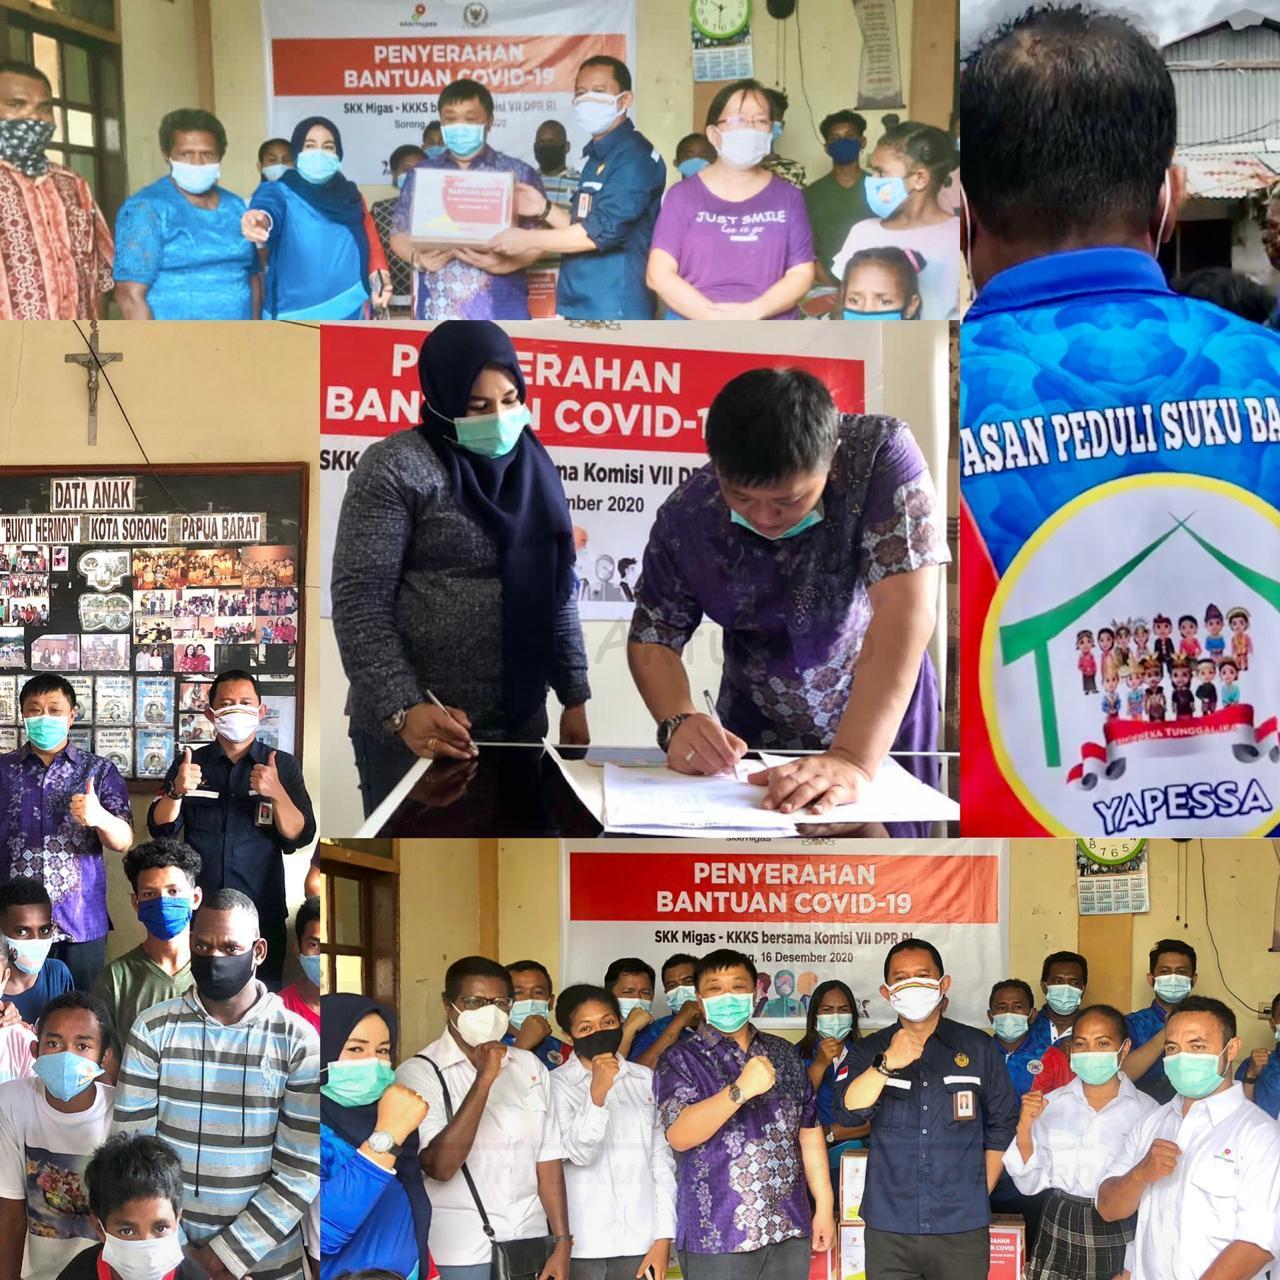 Di Bulan Kasih, SKK Migas Bersinergi Bersama DPR-RI Komisi VII Berbagi Bantuan COVID di Sorong 2 IMG 20201216 WA0107 1